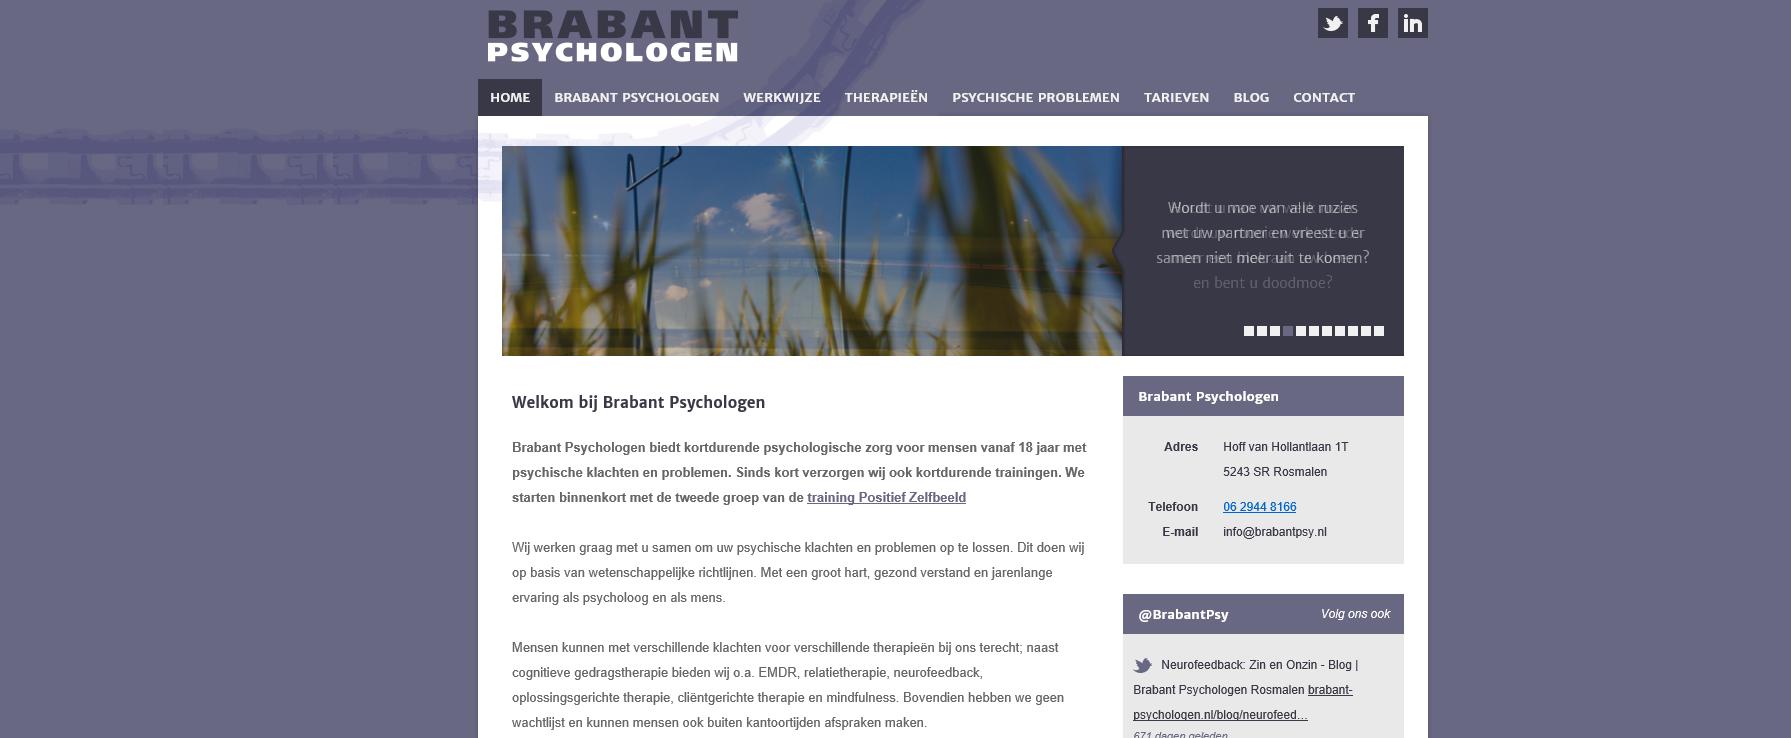 Brabant Psychologen